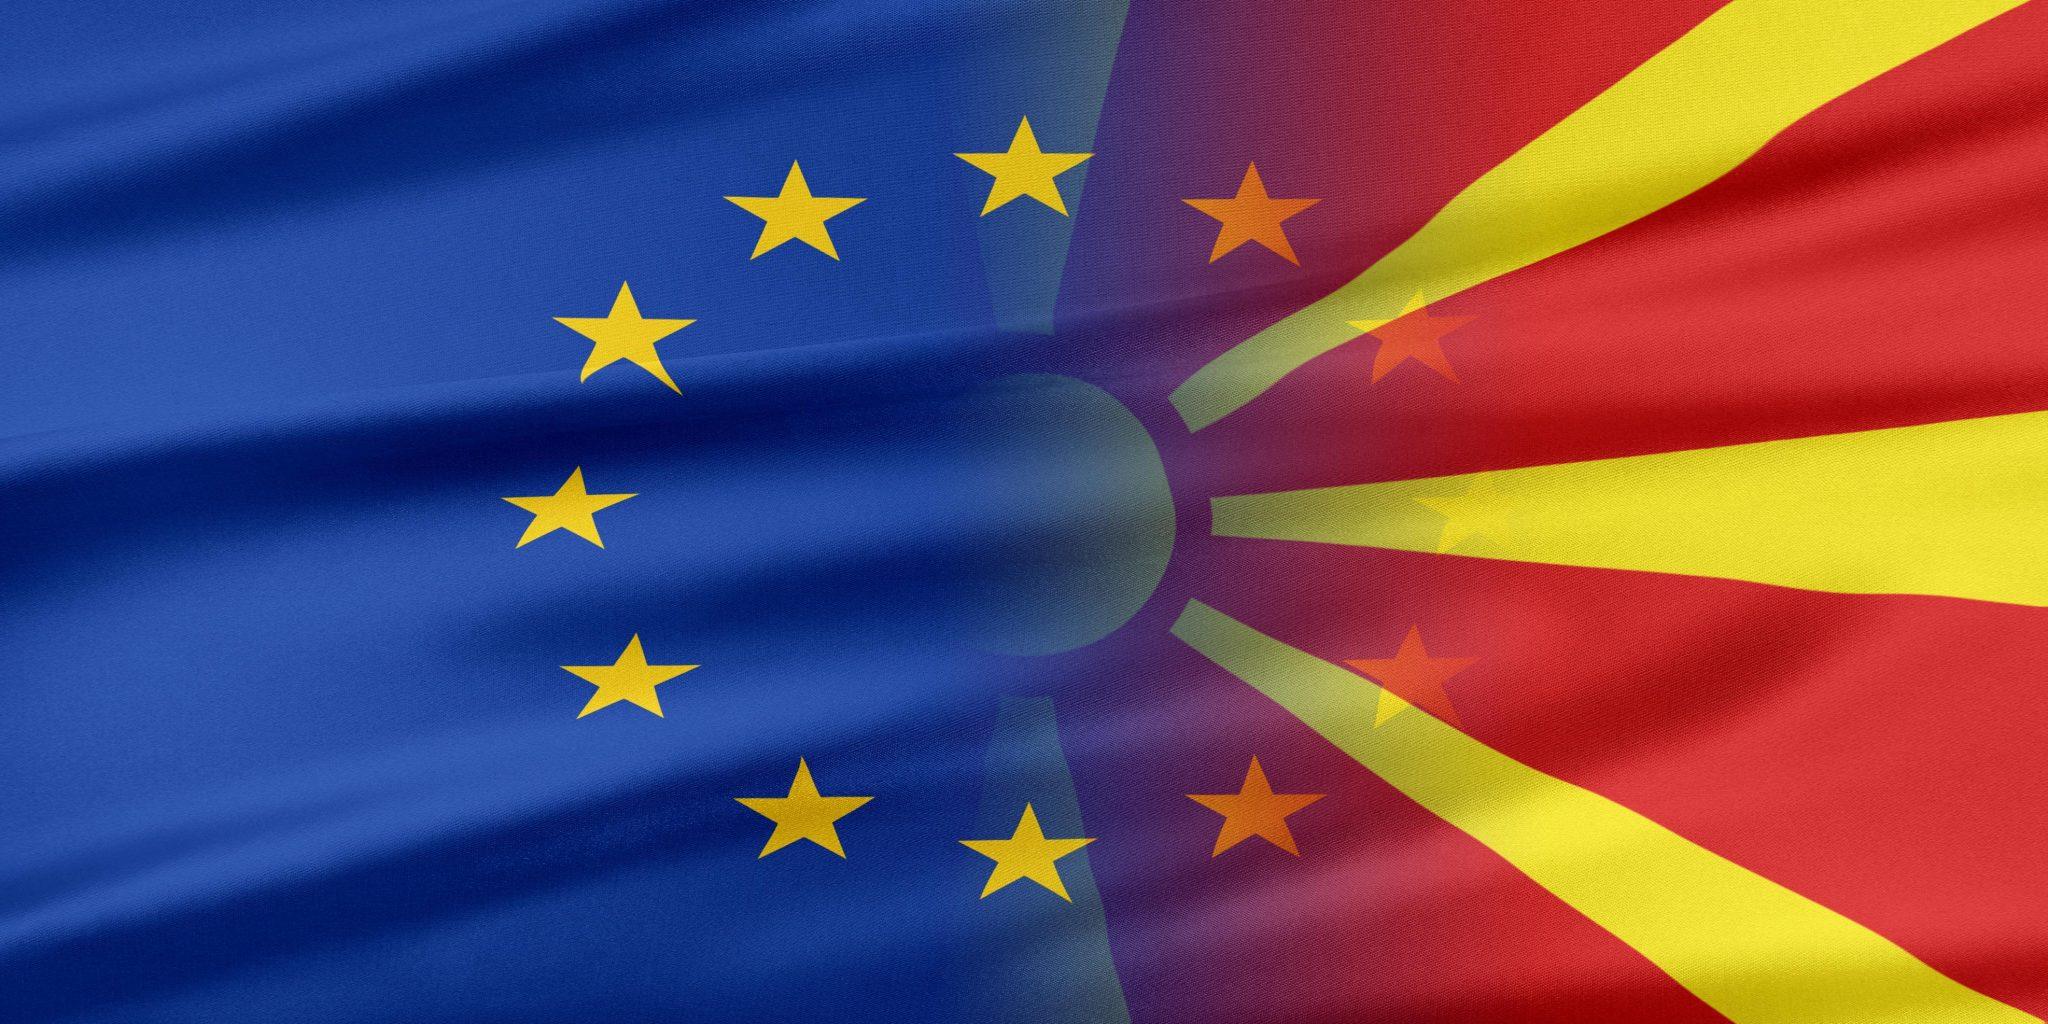 BiEPAG's Experts React: EC 2020 Progress Report on North Macedonia